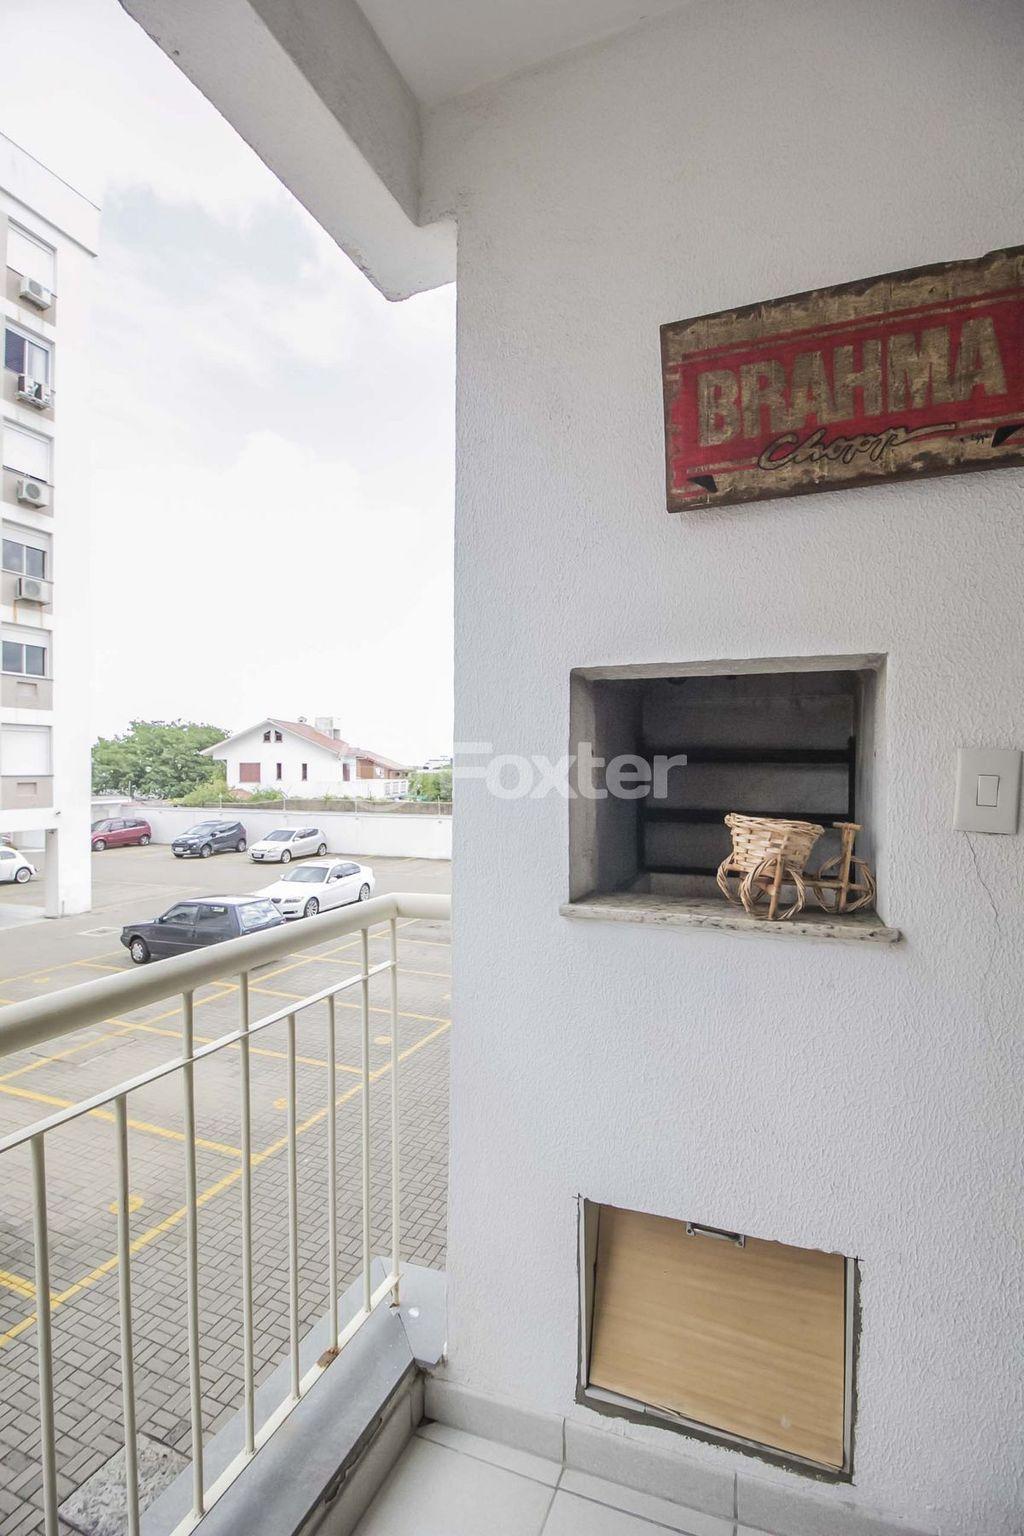 Apto 2 Dorm, Sarandi, Porto Alegre (136066) - Foto 27